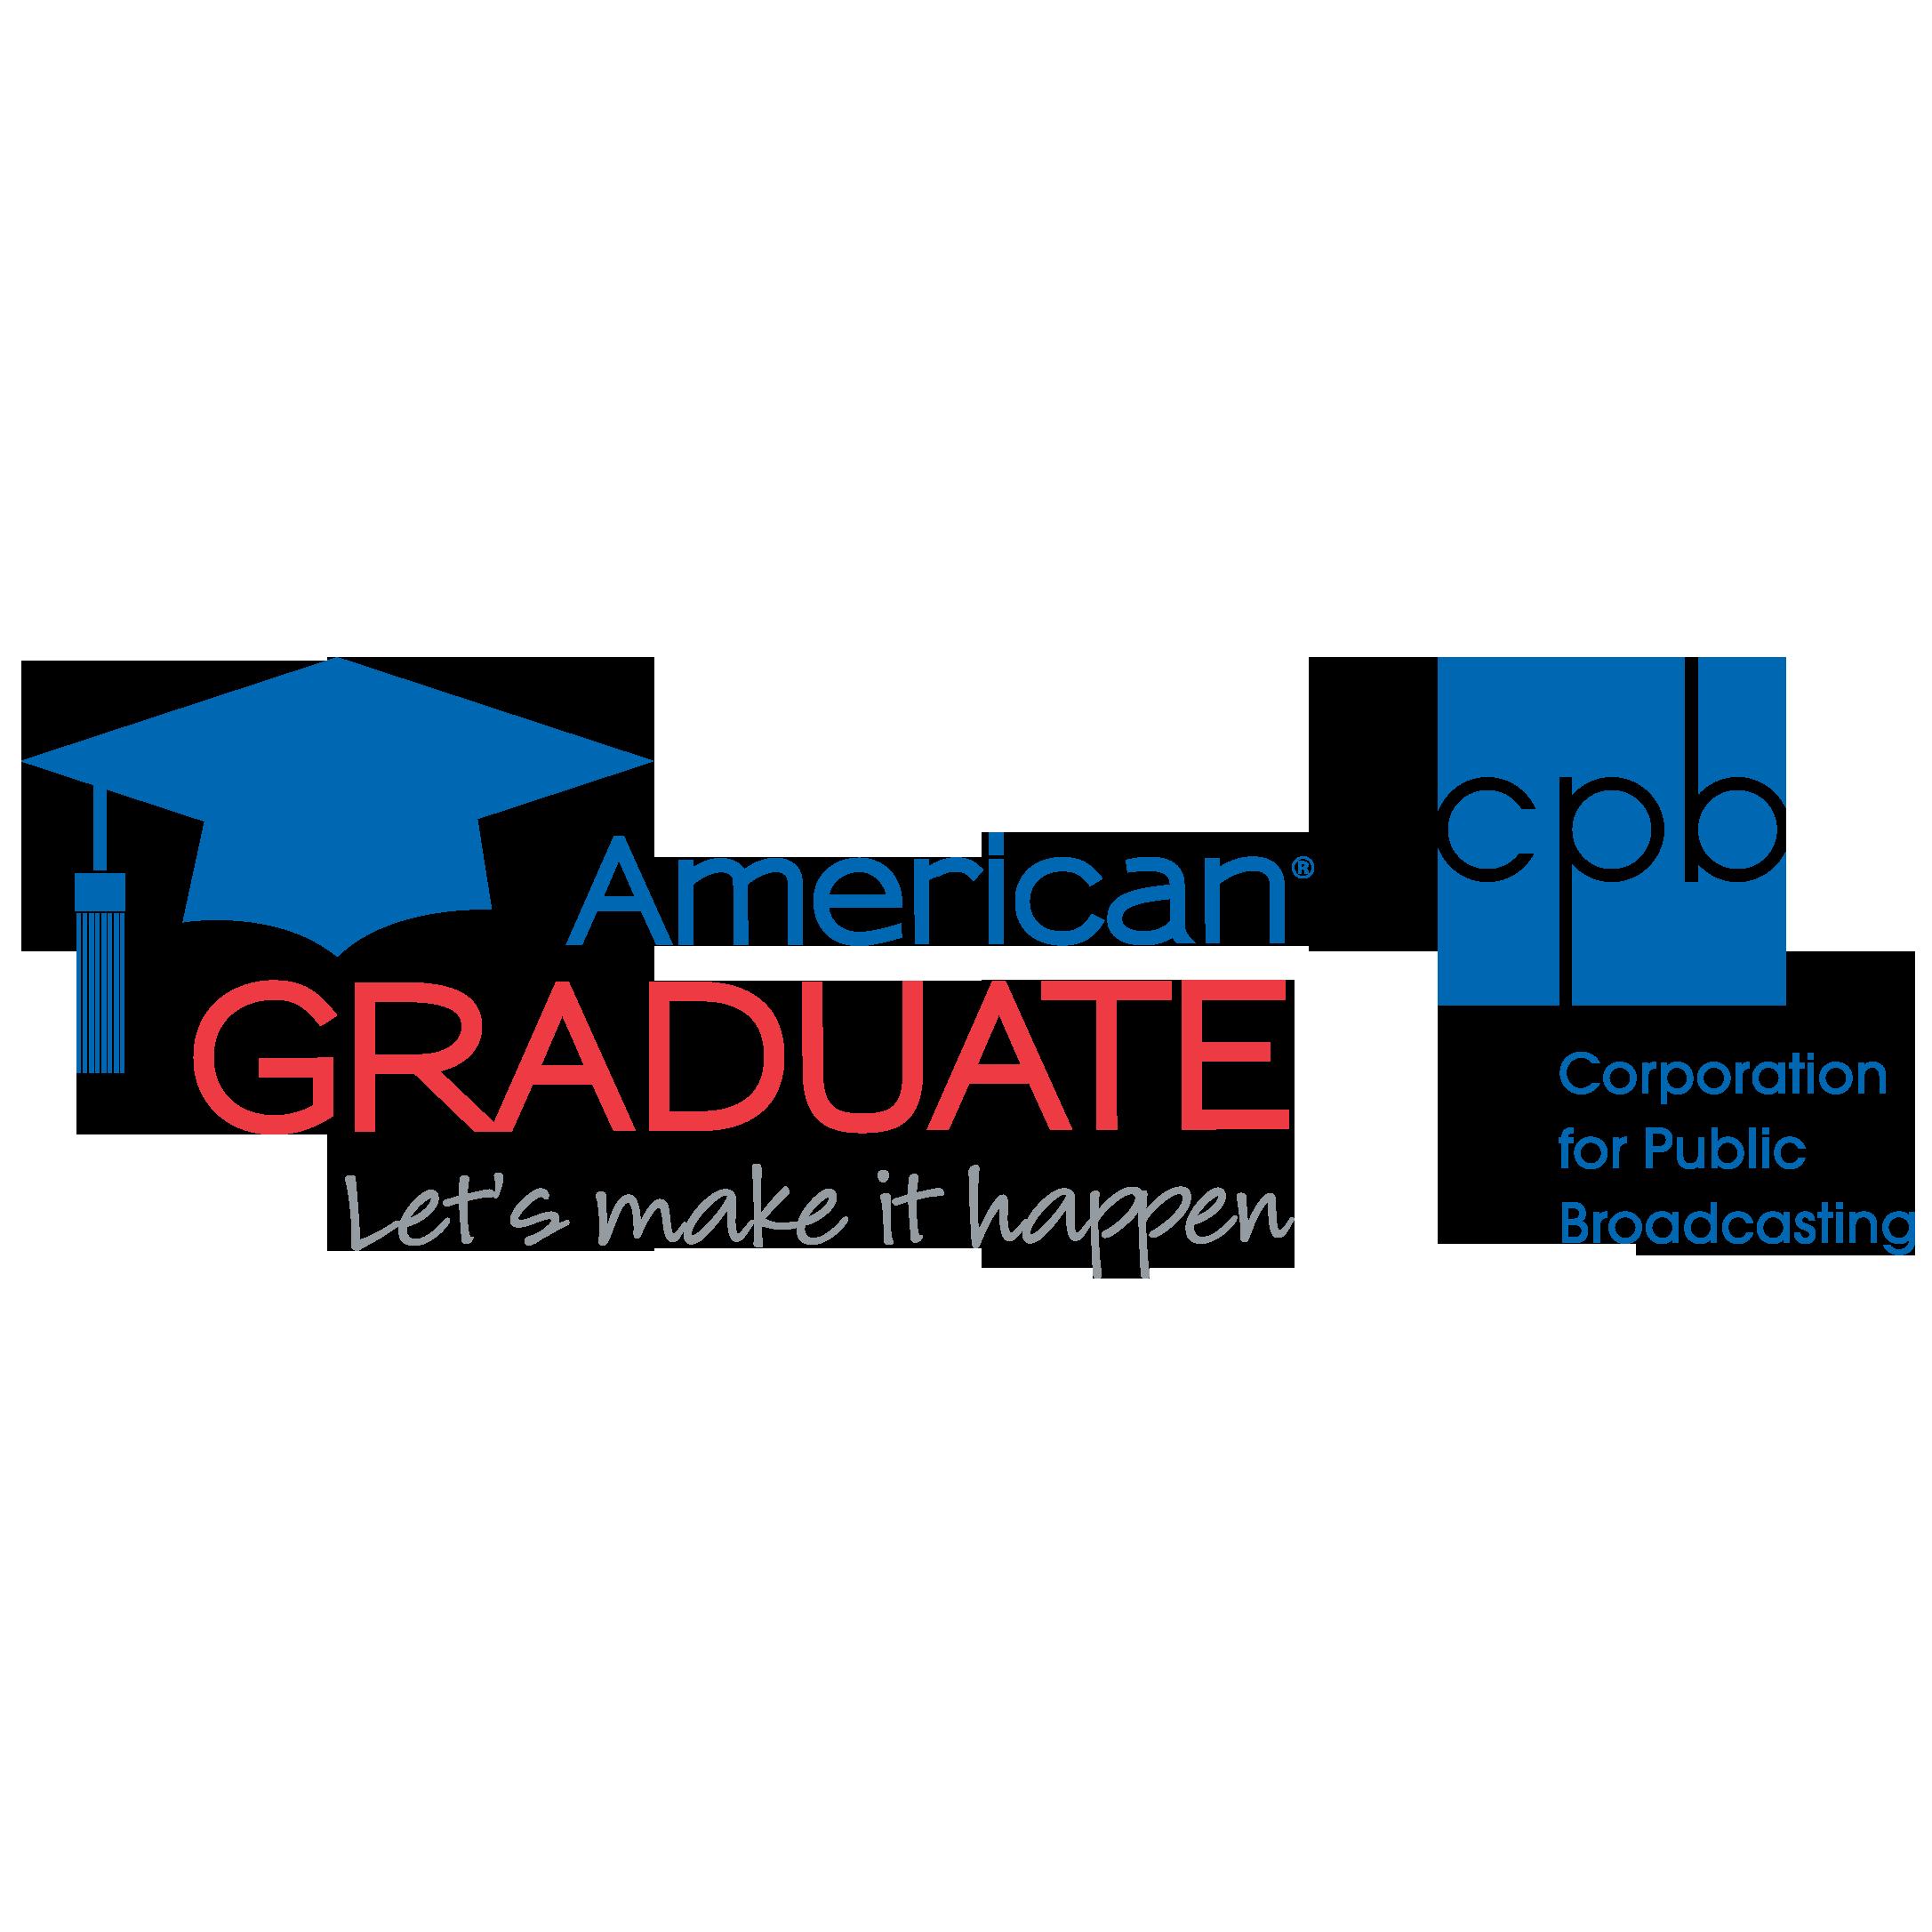 American Graduate: Let's Make It Happen